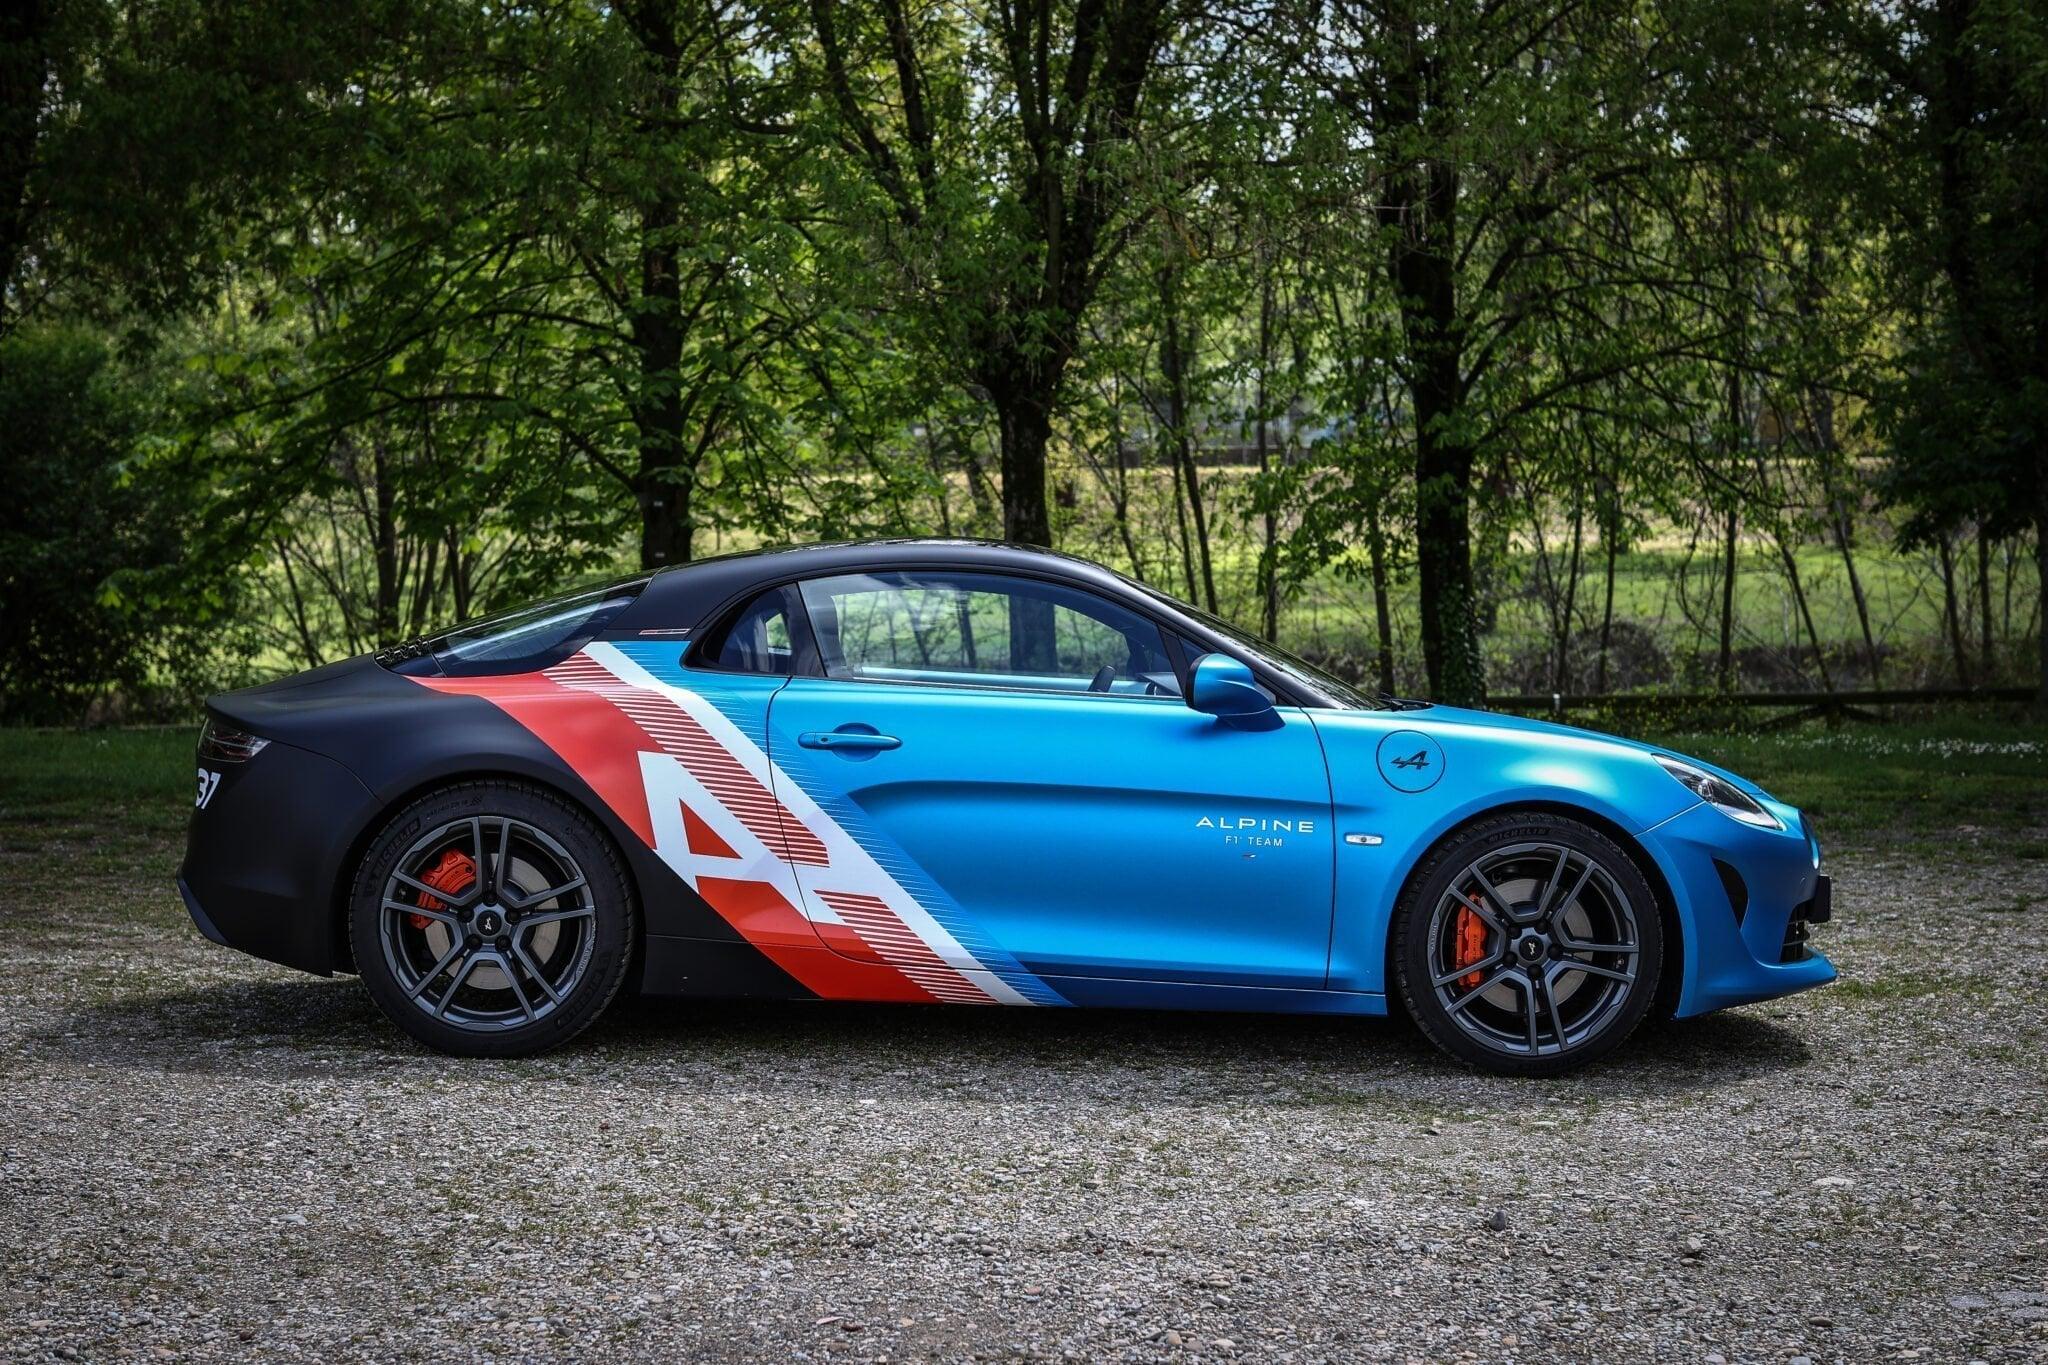 Alpine A110 Trackside Alonso Ocon 2021 11 | Alpine A110 Trackside : la berlinette aux couleurs de la F1